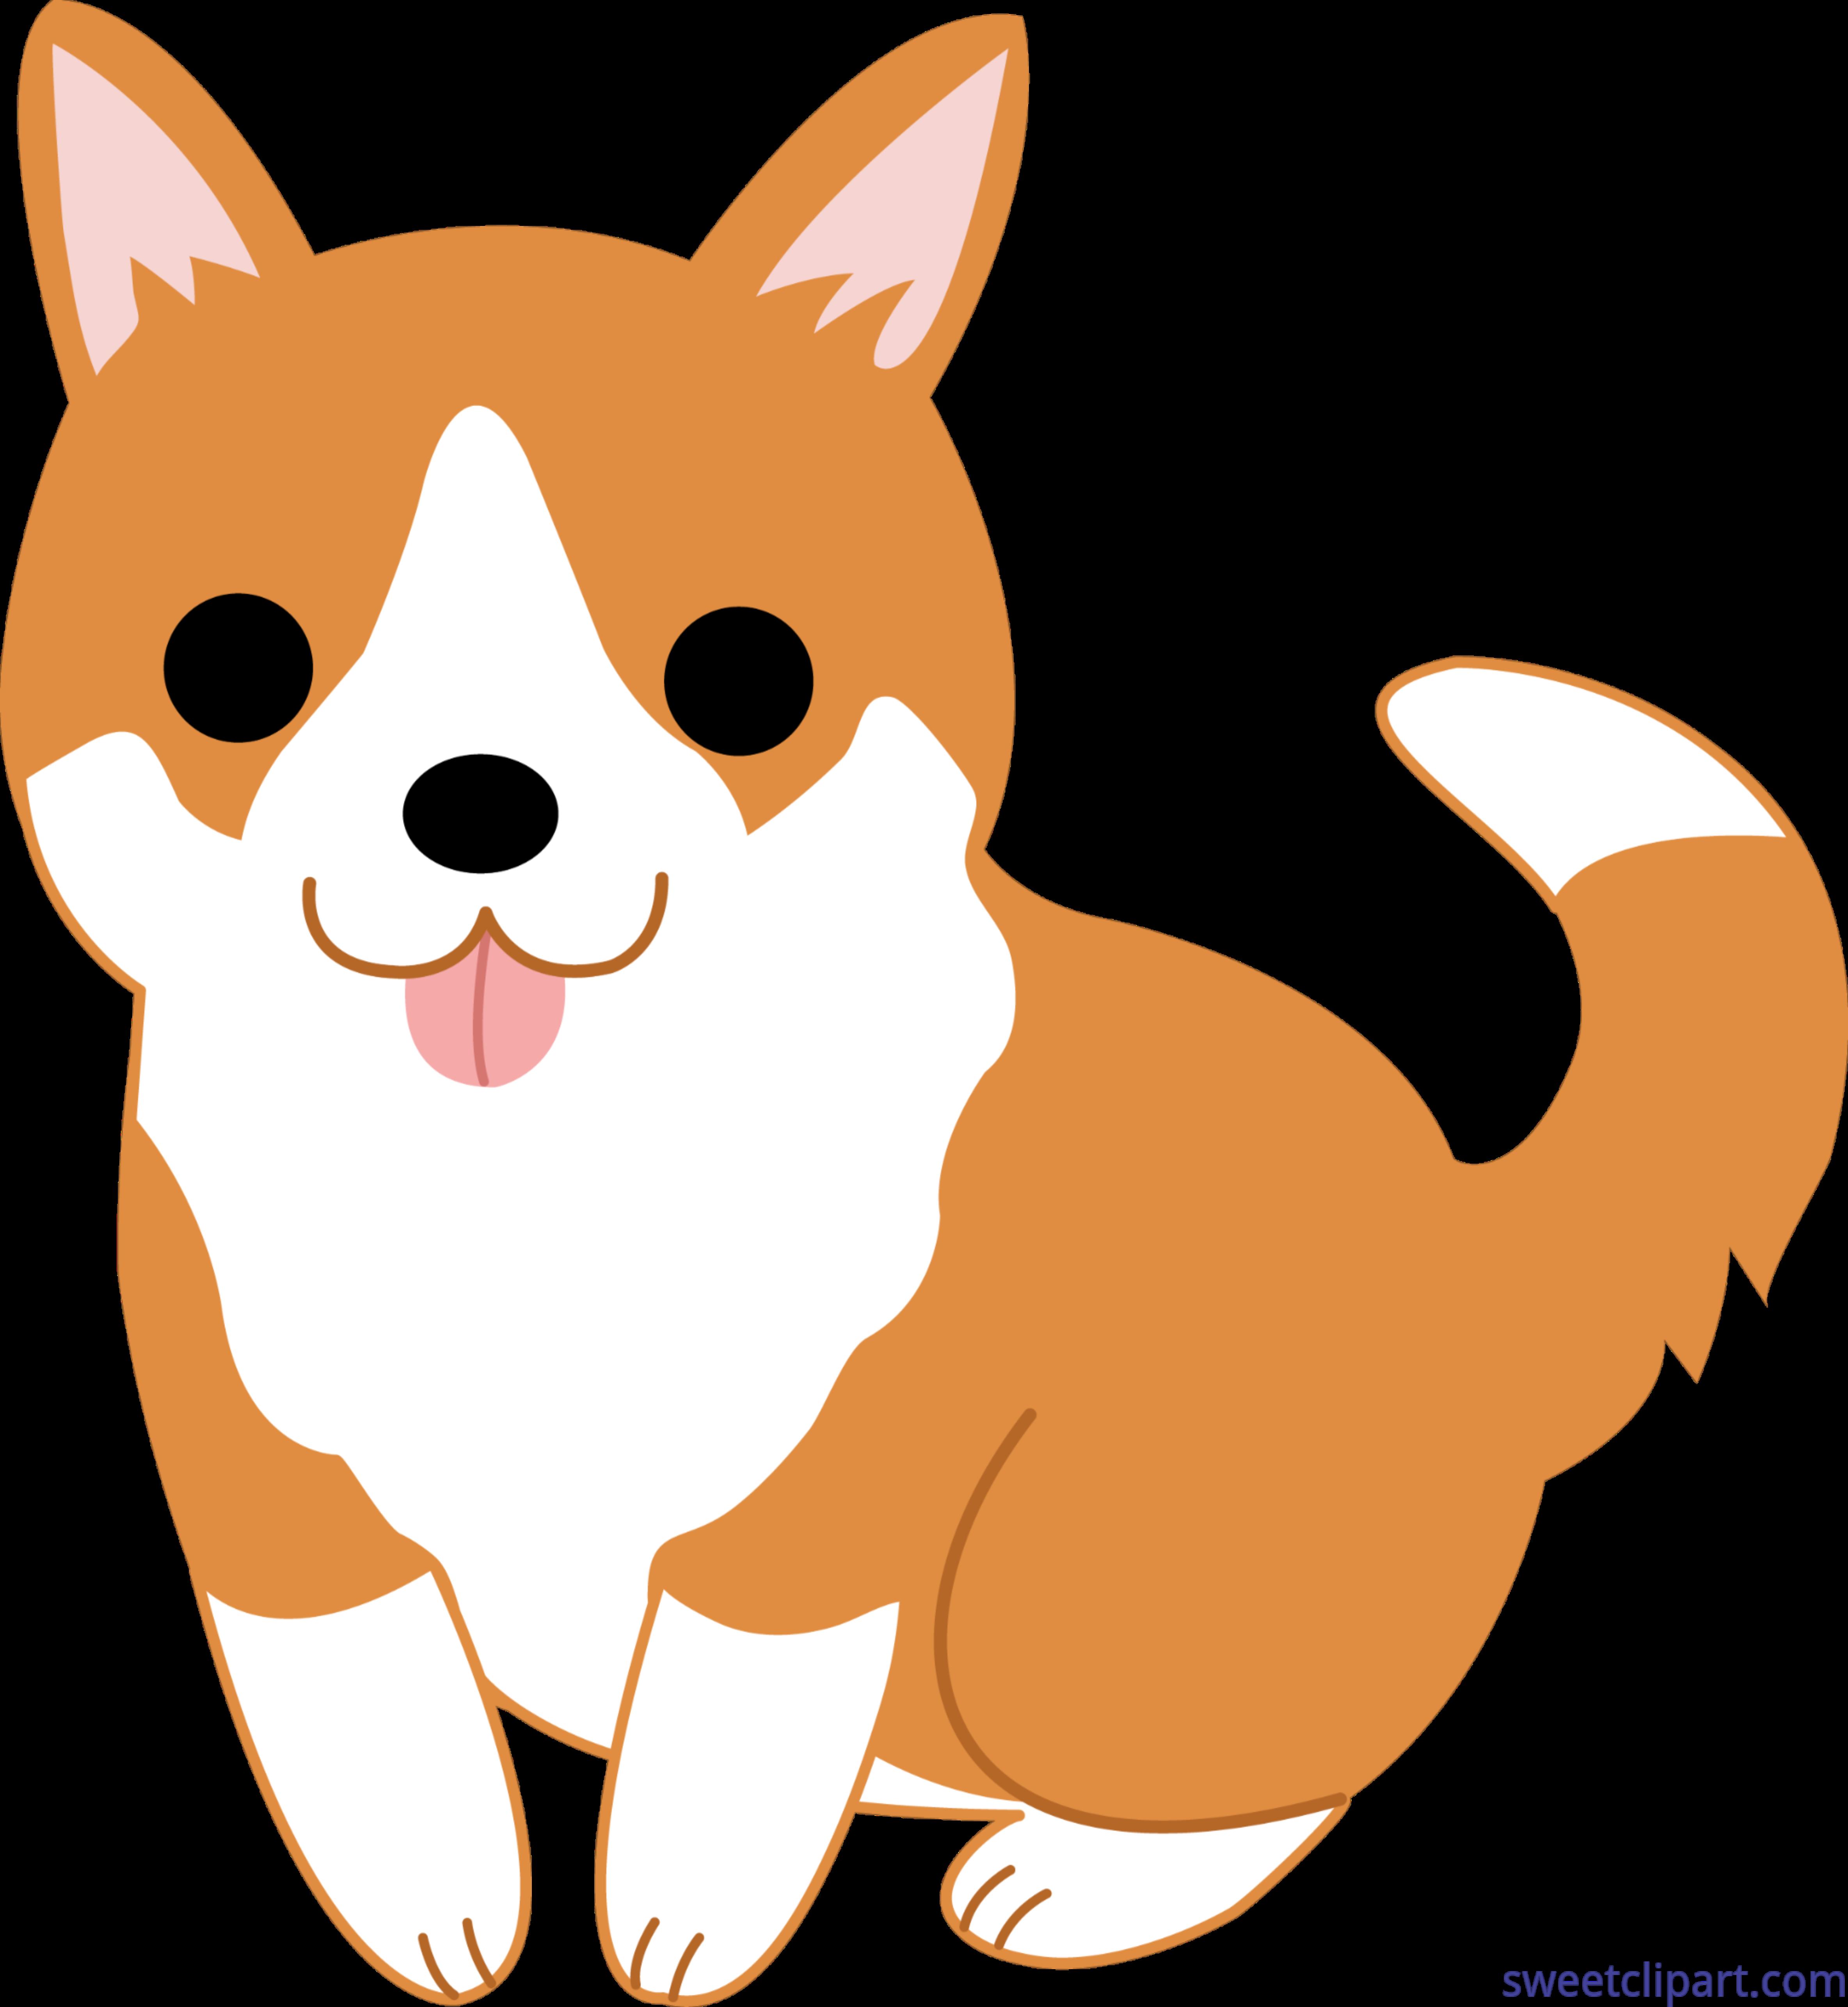 Corgi clipart. Cute puppy clip art